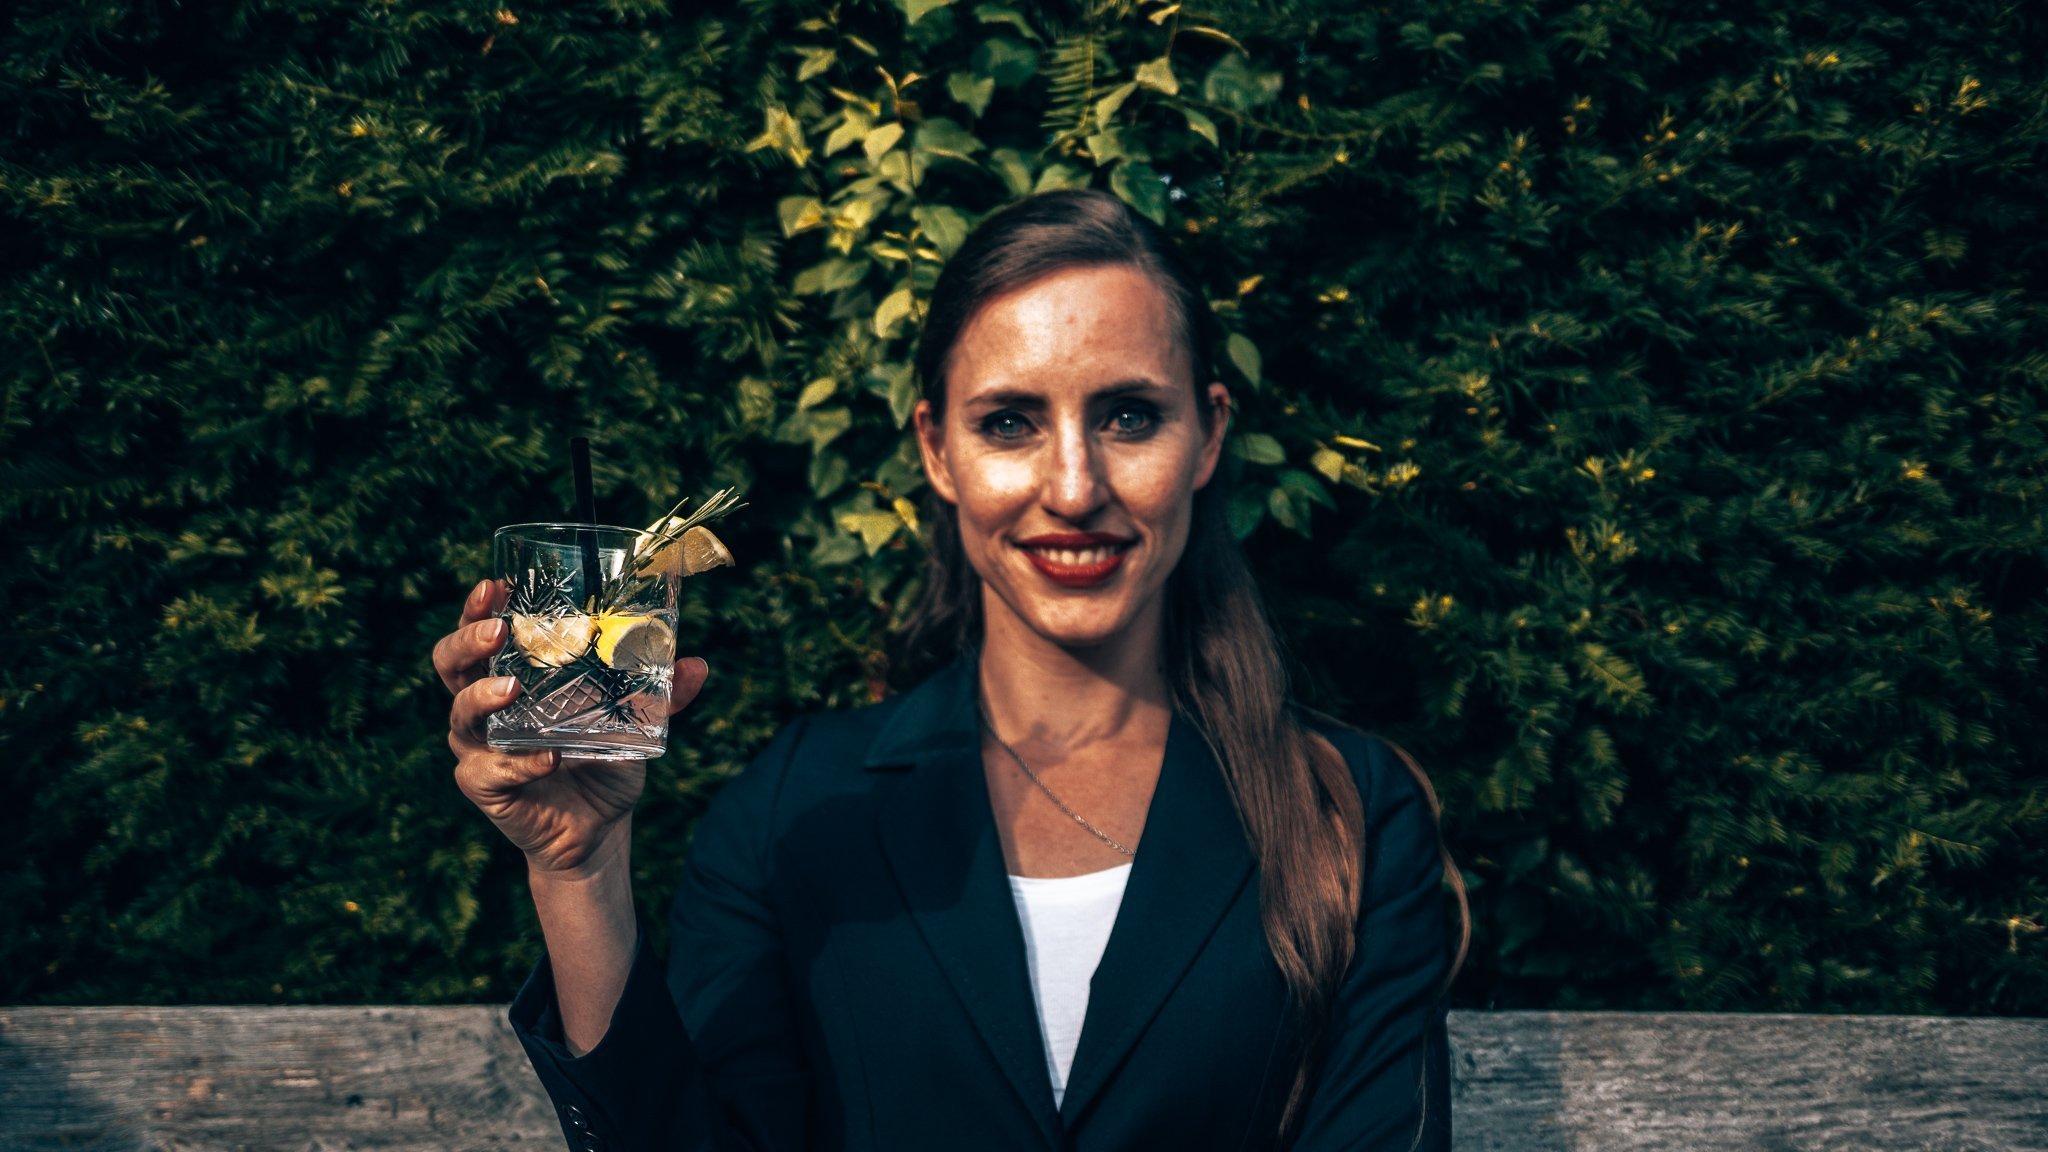 Cindy van der Lubbe, Seven Seas Spirits, Alles over gin.